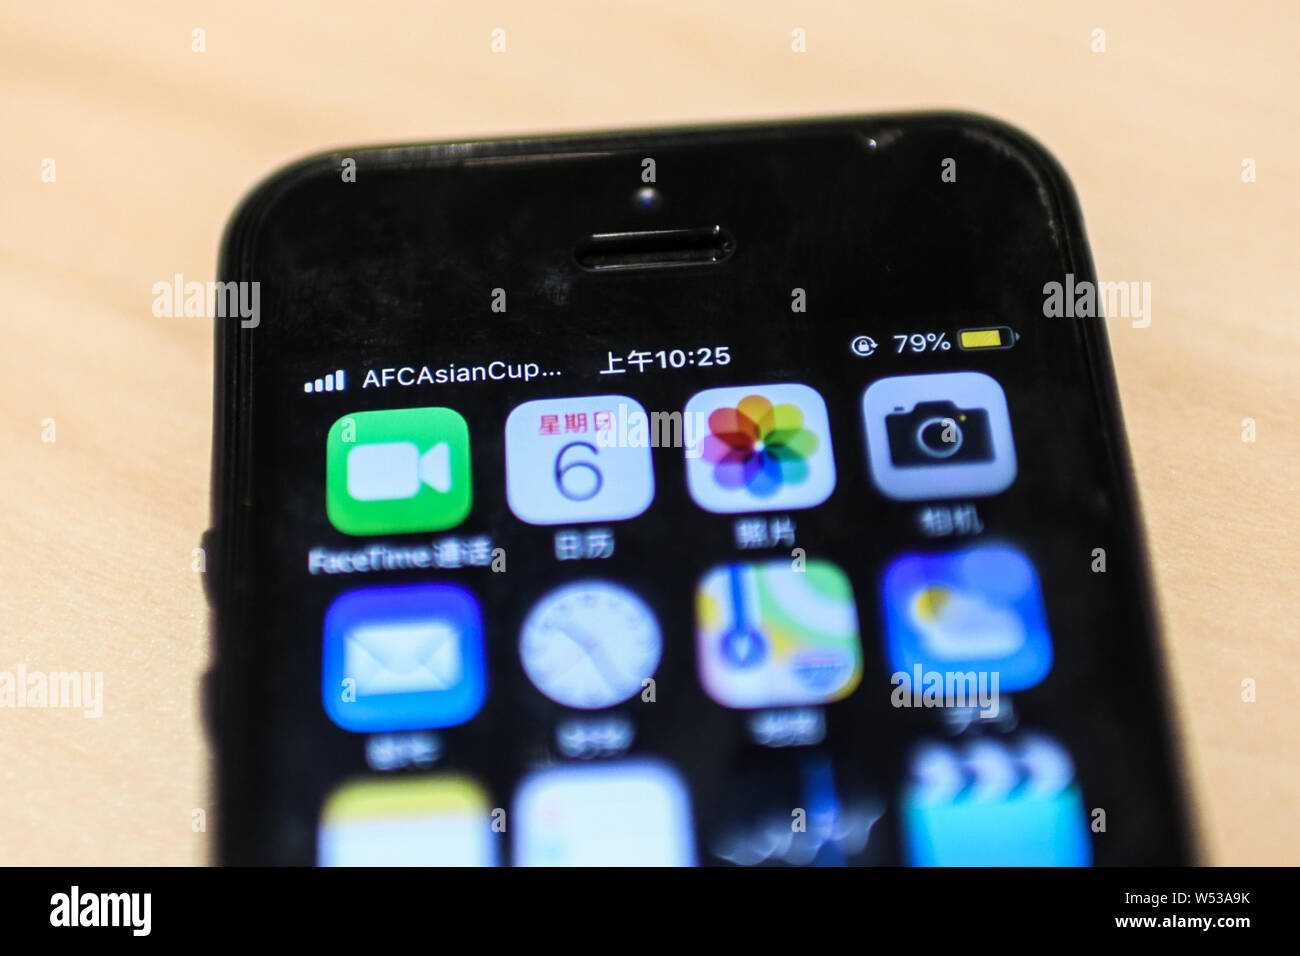 Uae Mobile Network Name